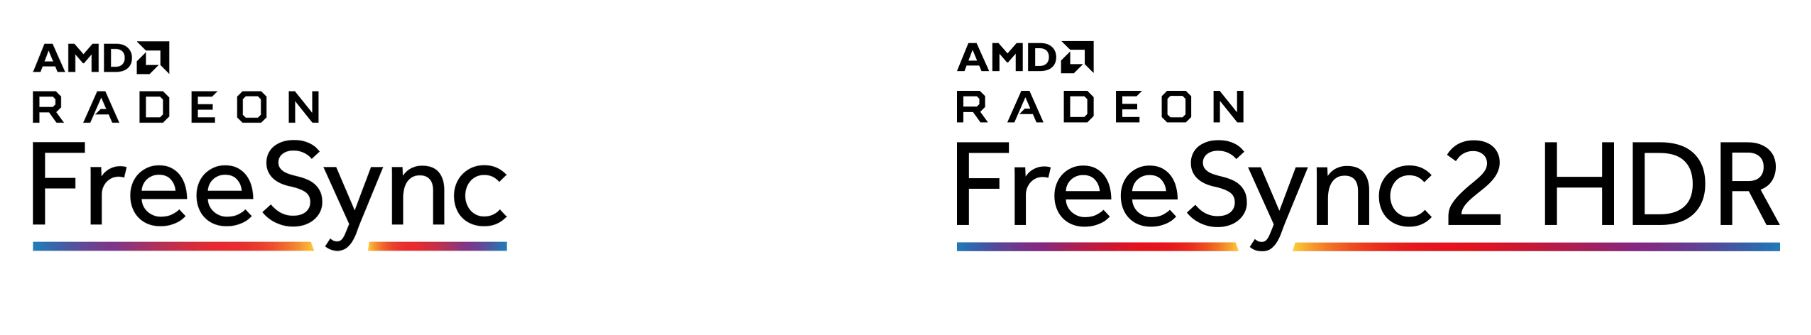 Radeon FreeSync